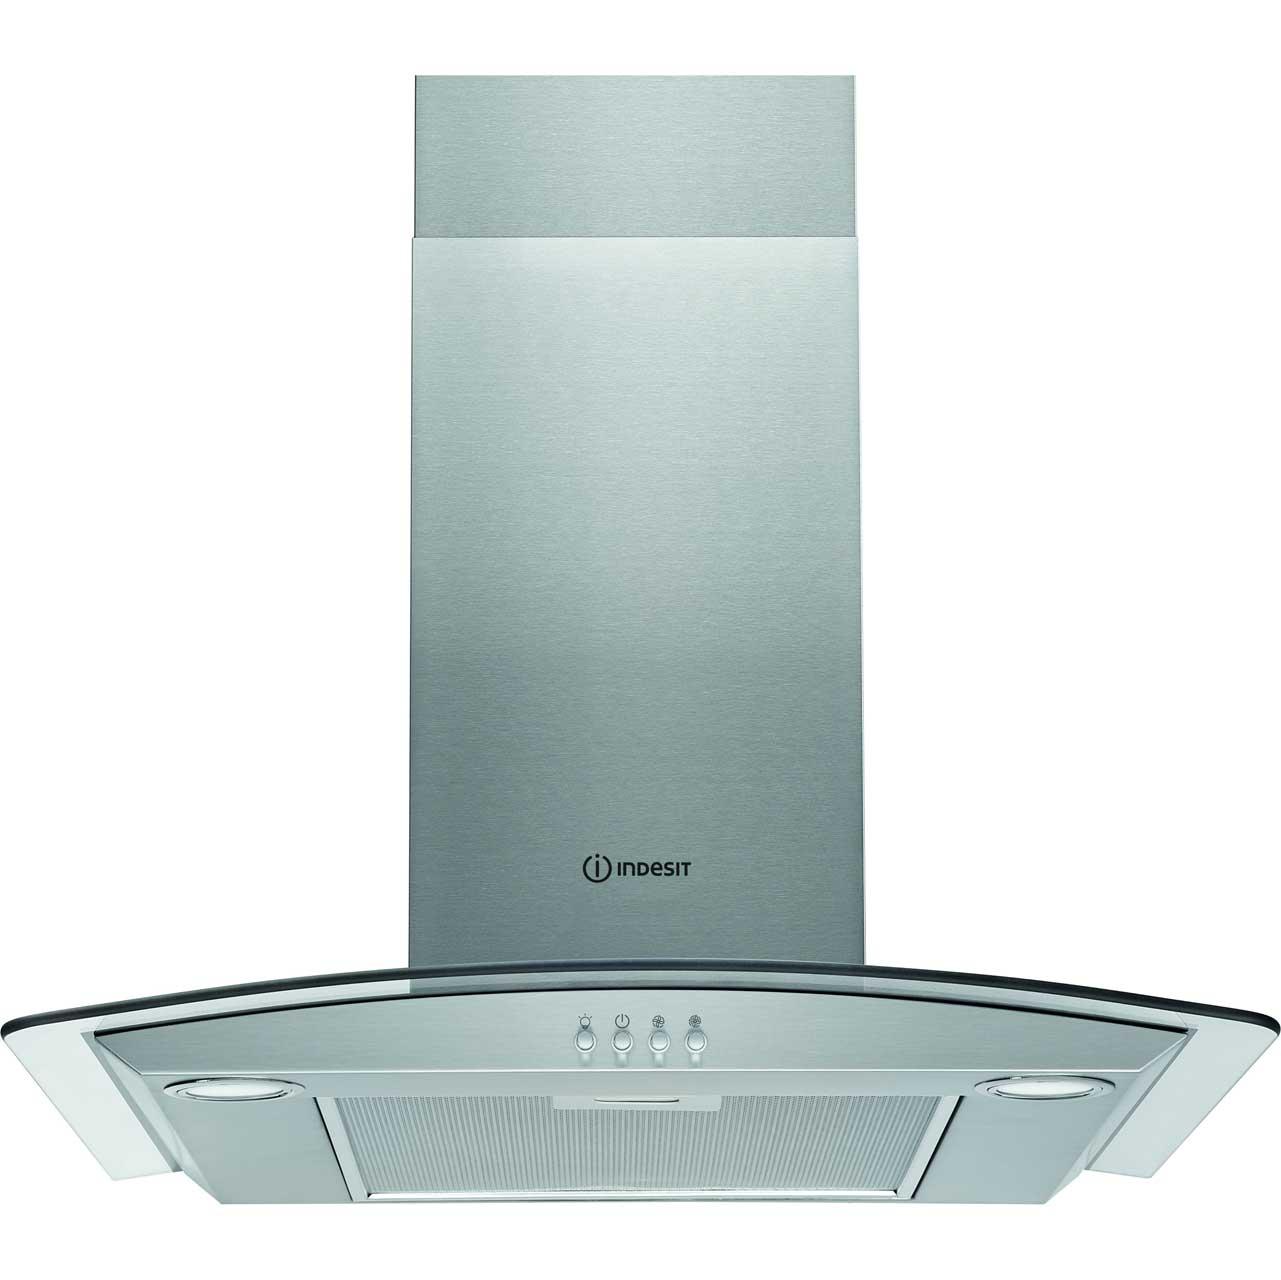 IHGC6.4AMX_SS | Indesit chimney cooker hood | ao.com